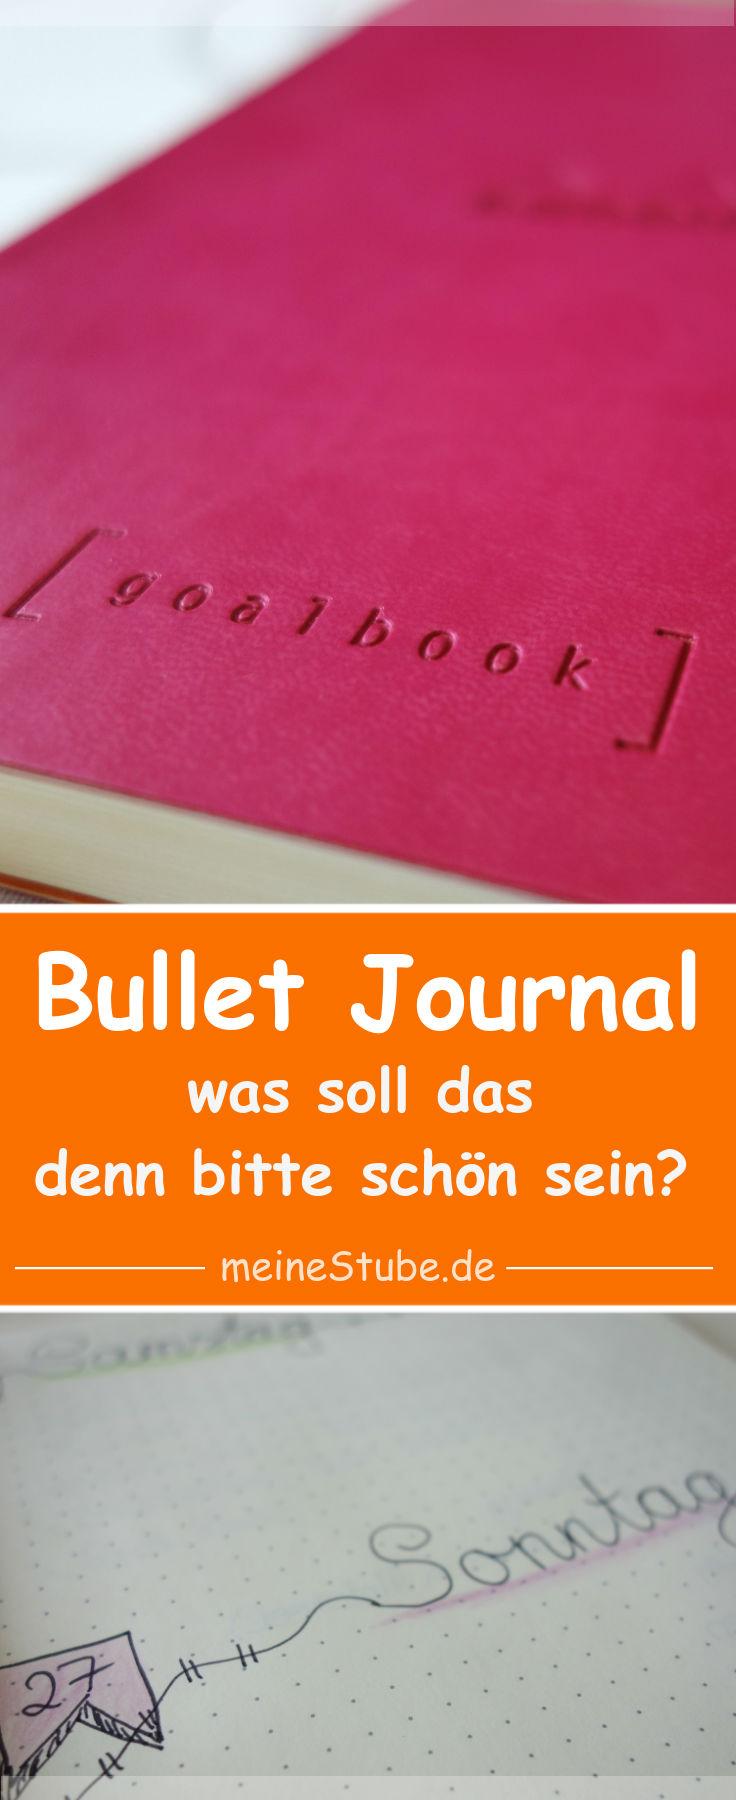 Bullet-journal-was-bitte.jpg